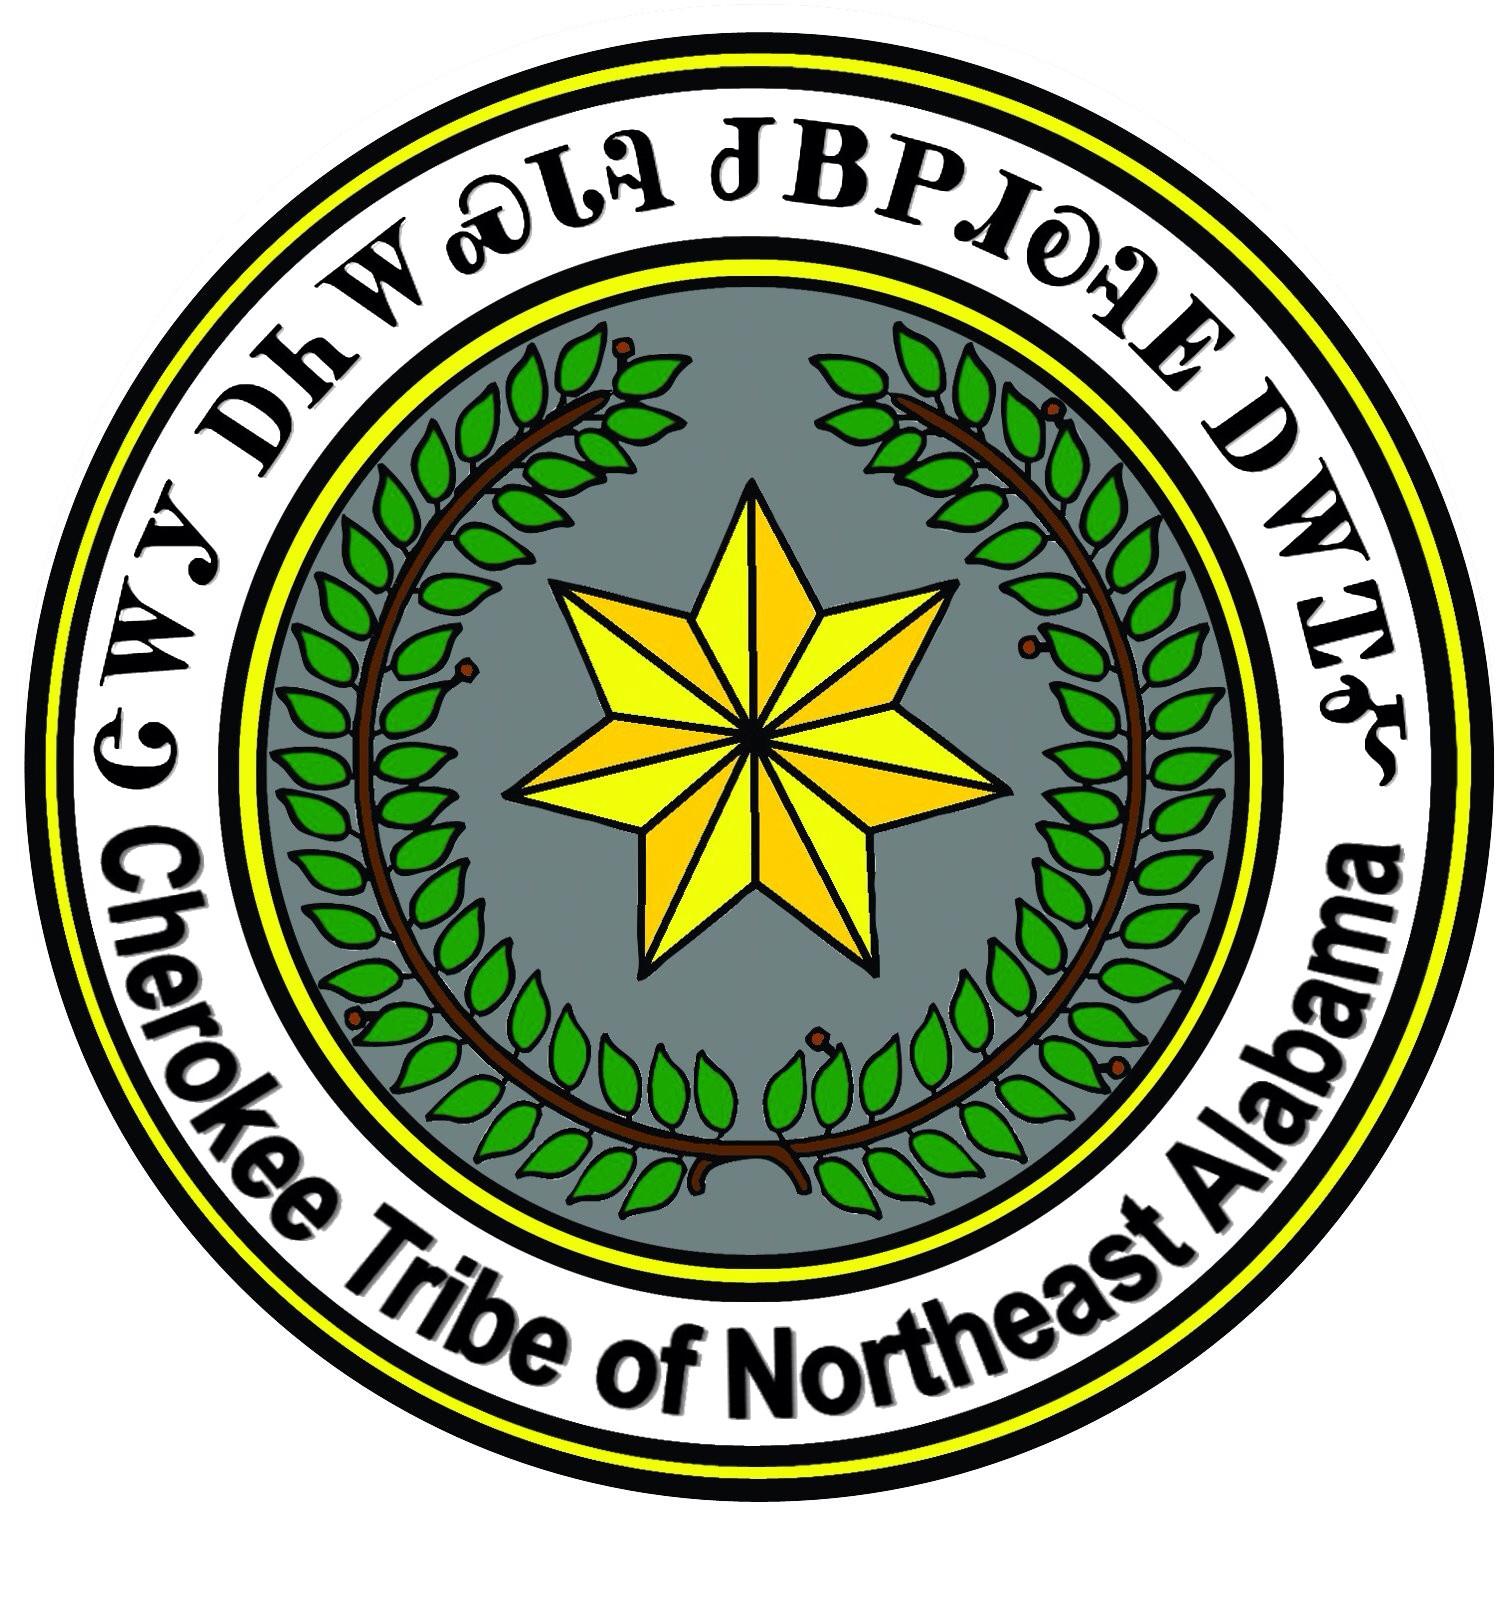 Filecherokee Tribe Of Northeast Alabama Logo 2014 05 31 09 11g